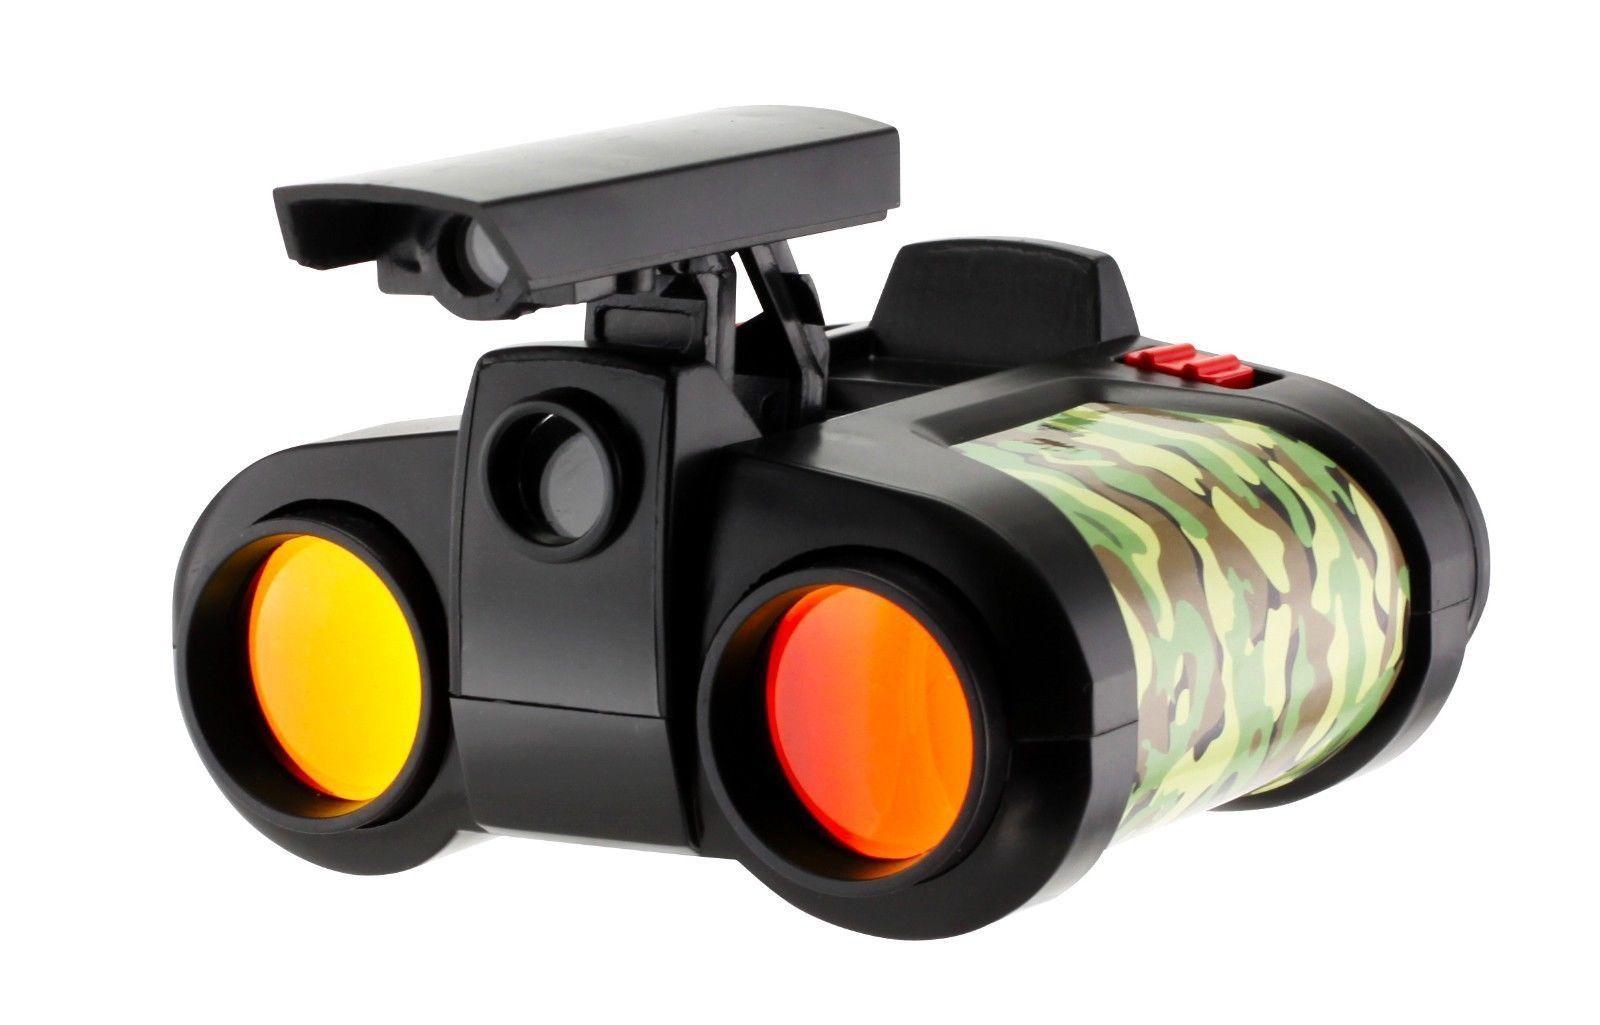 Night Scope 4x30mm Binoculars